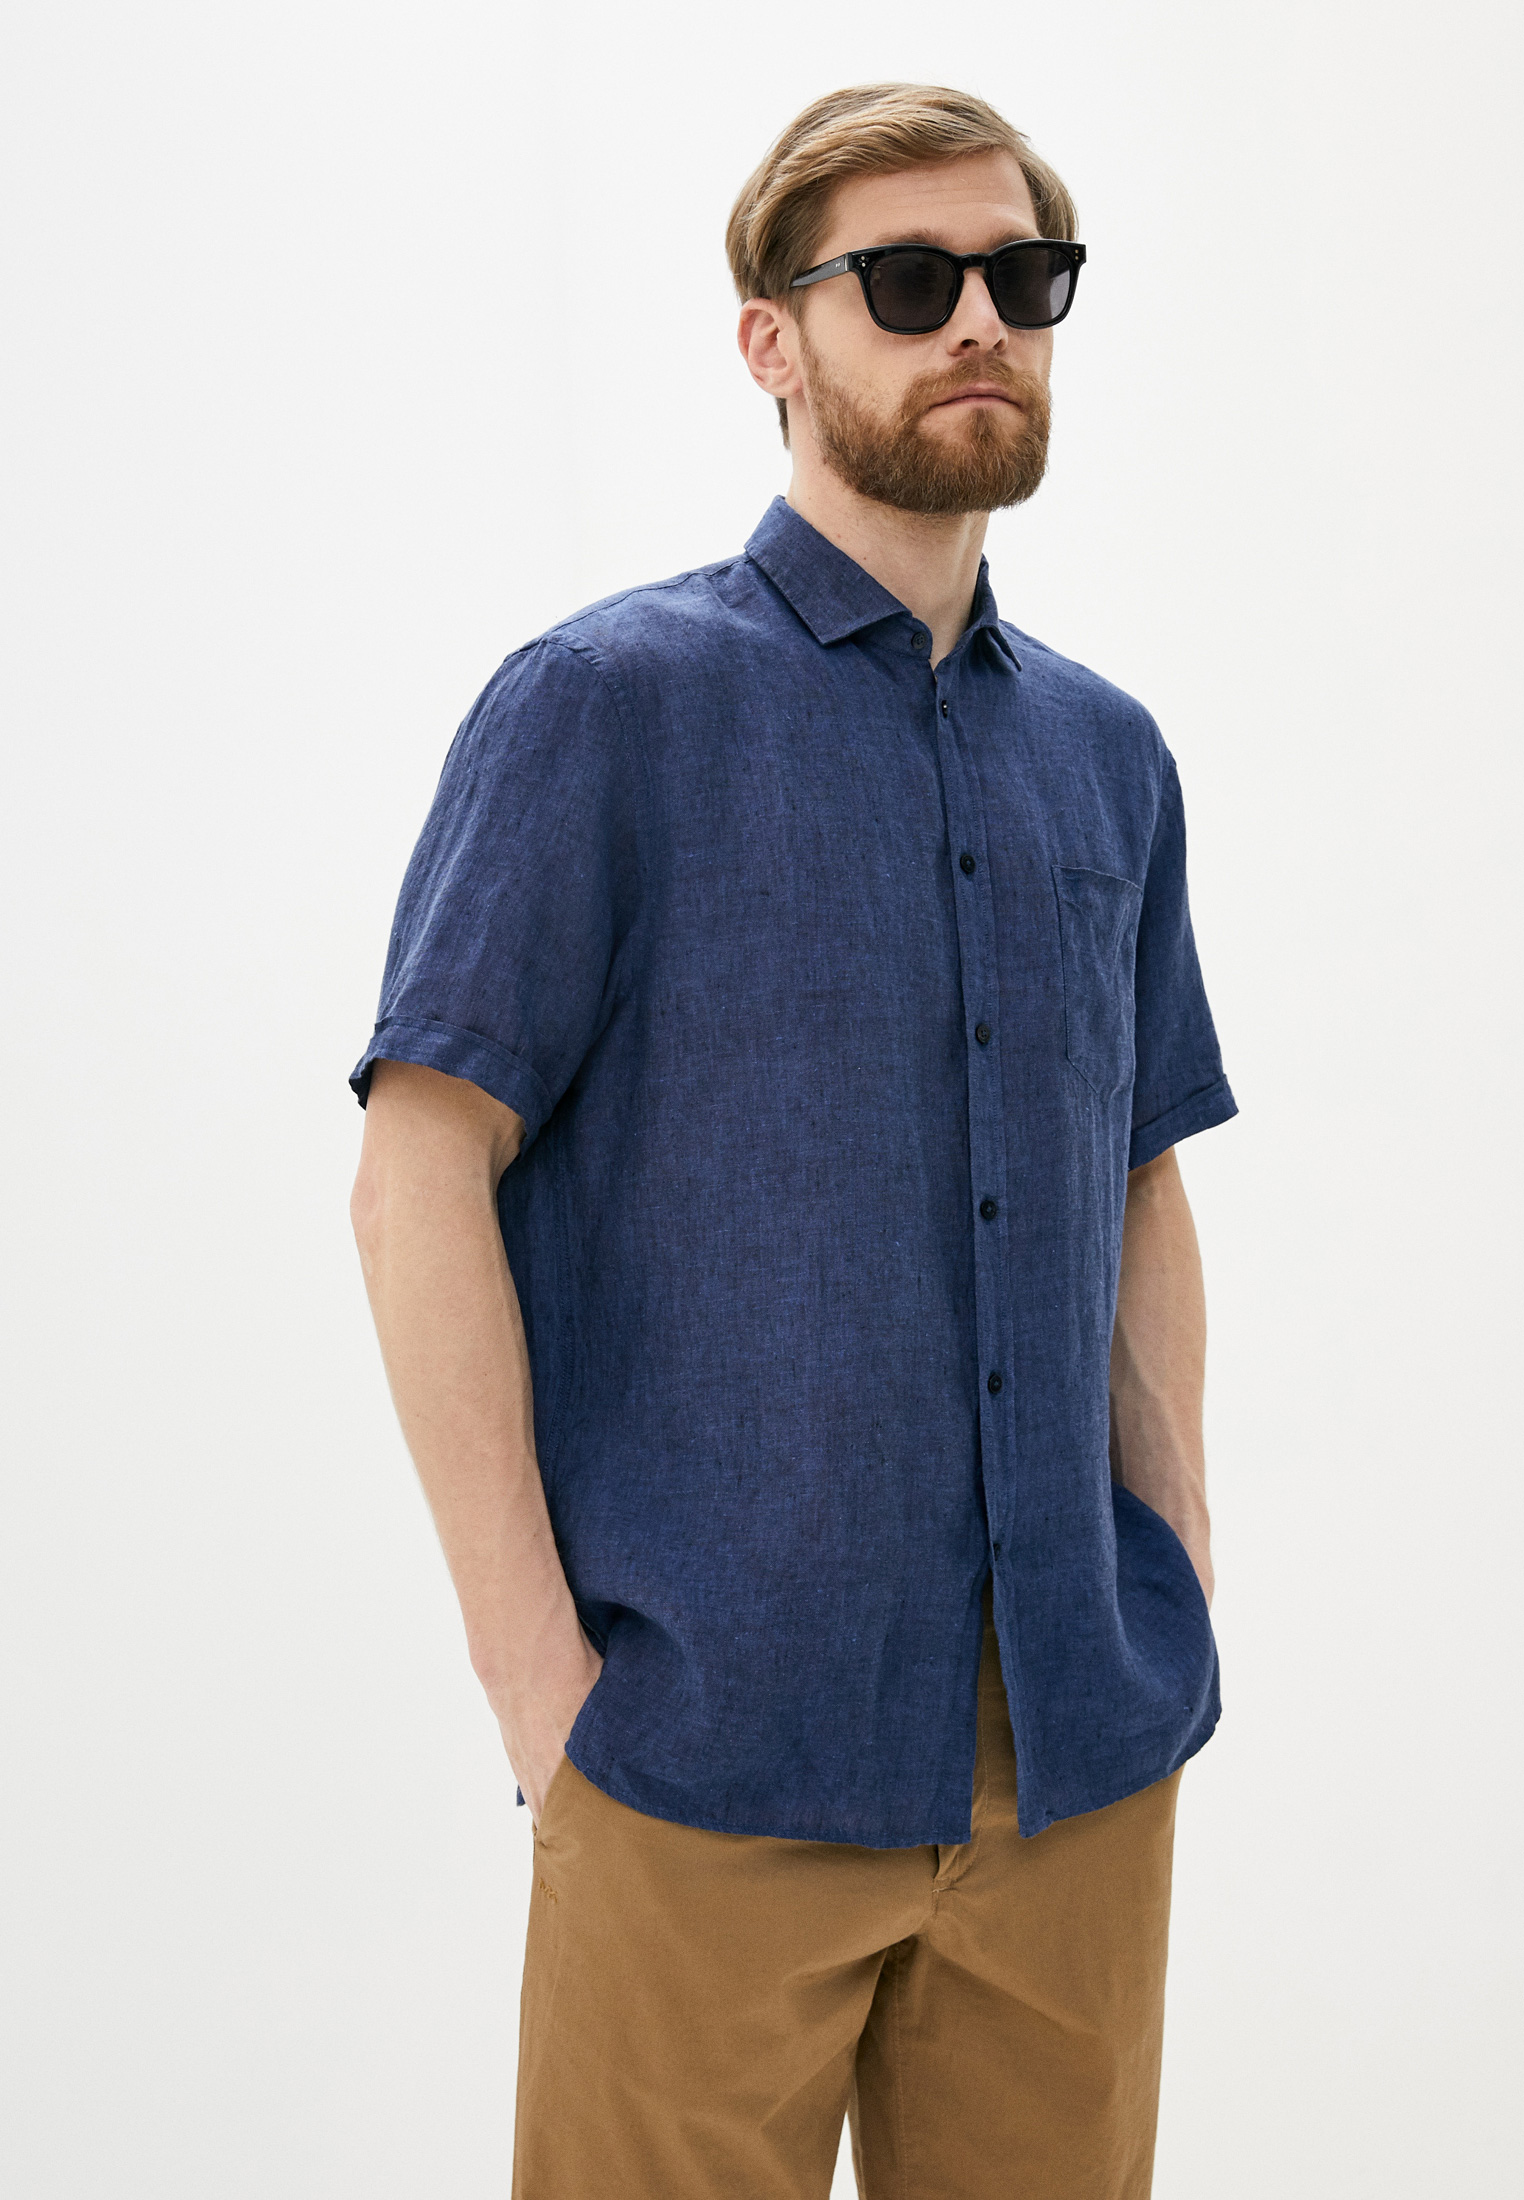 Рубашка с длинным рукавом Trussardi Jeans (Труссарди Джинс) 52c00140